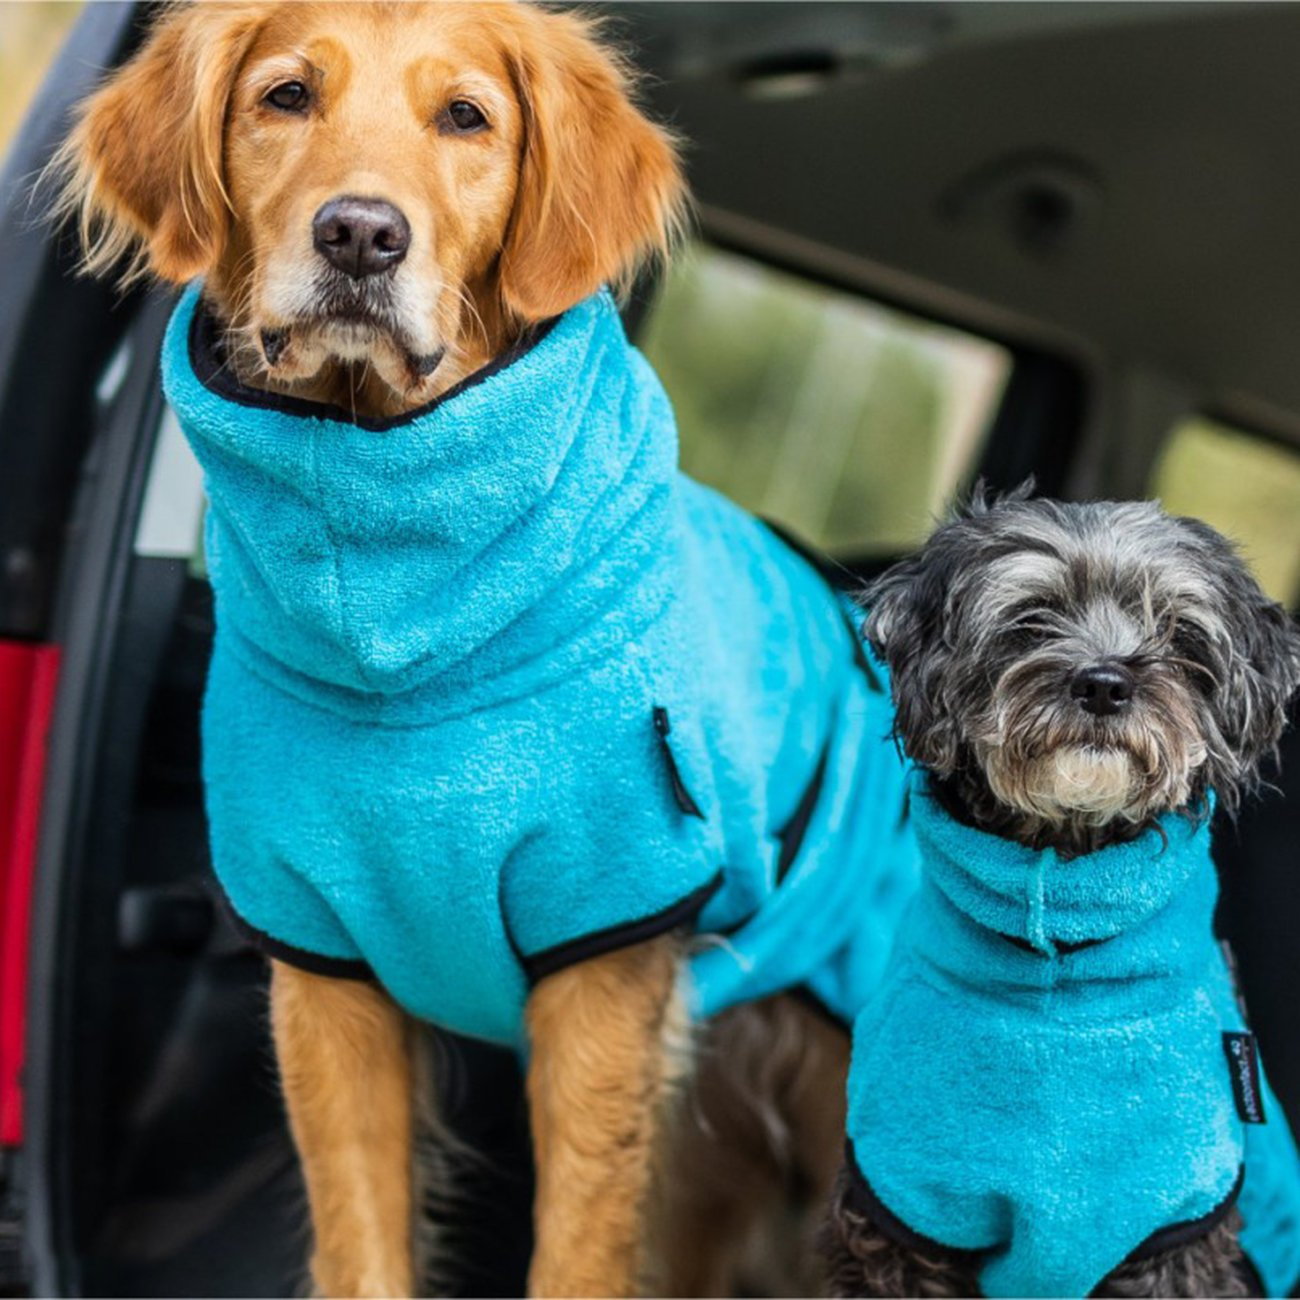 ActionFactory fit4dogs Dryup Mini Trockenmantel für Hunde, Bild 16